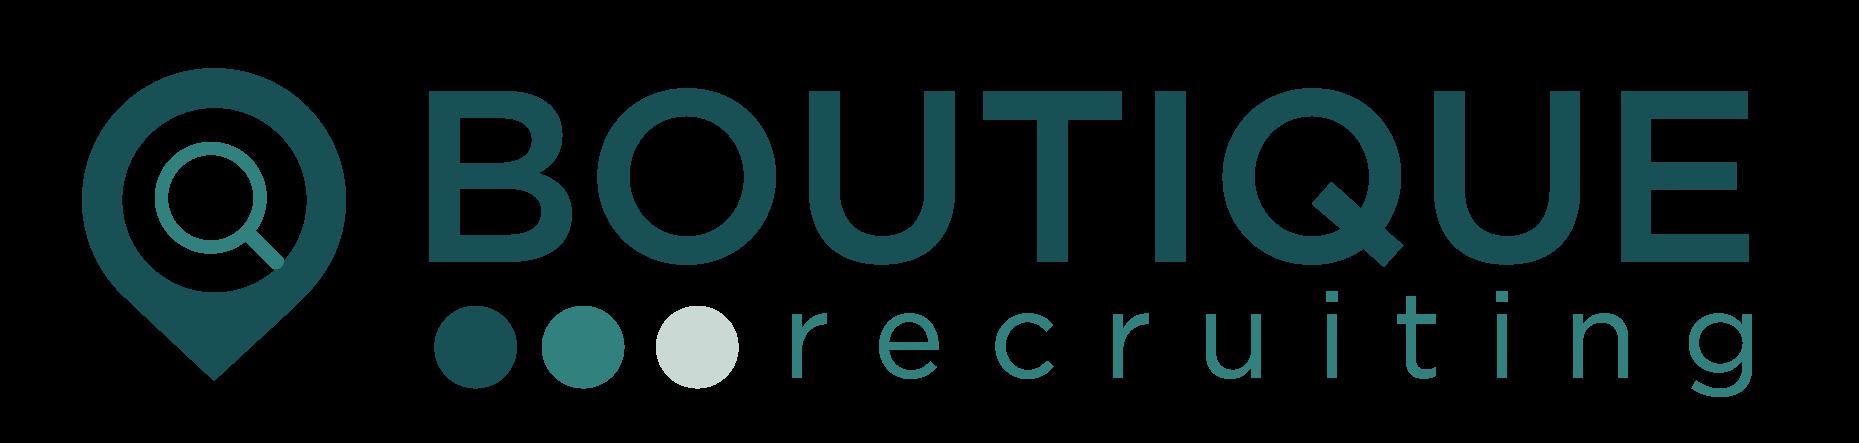 Boutique Recruting